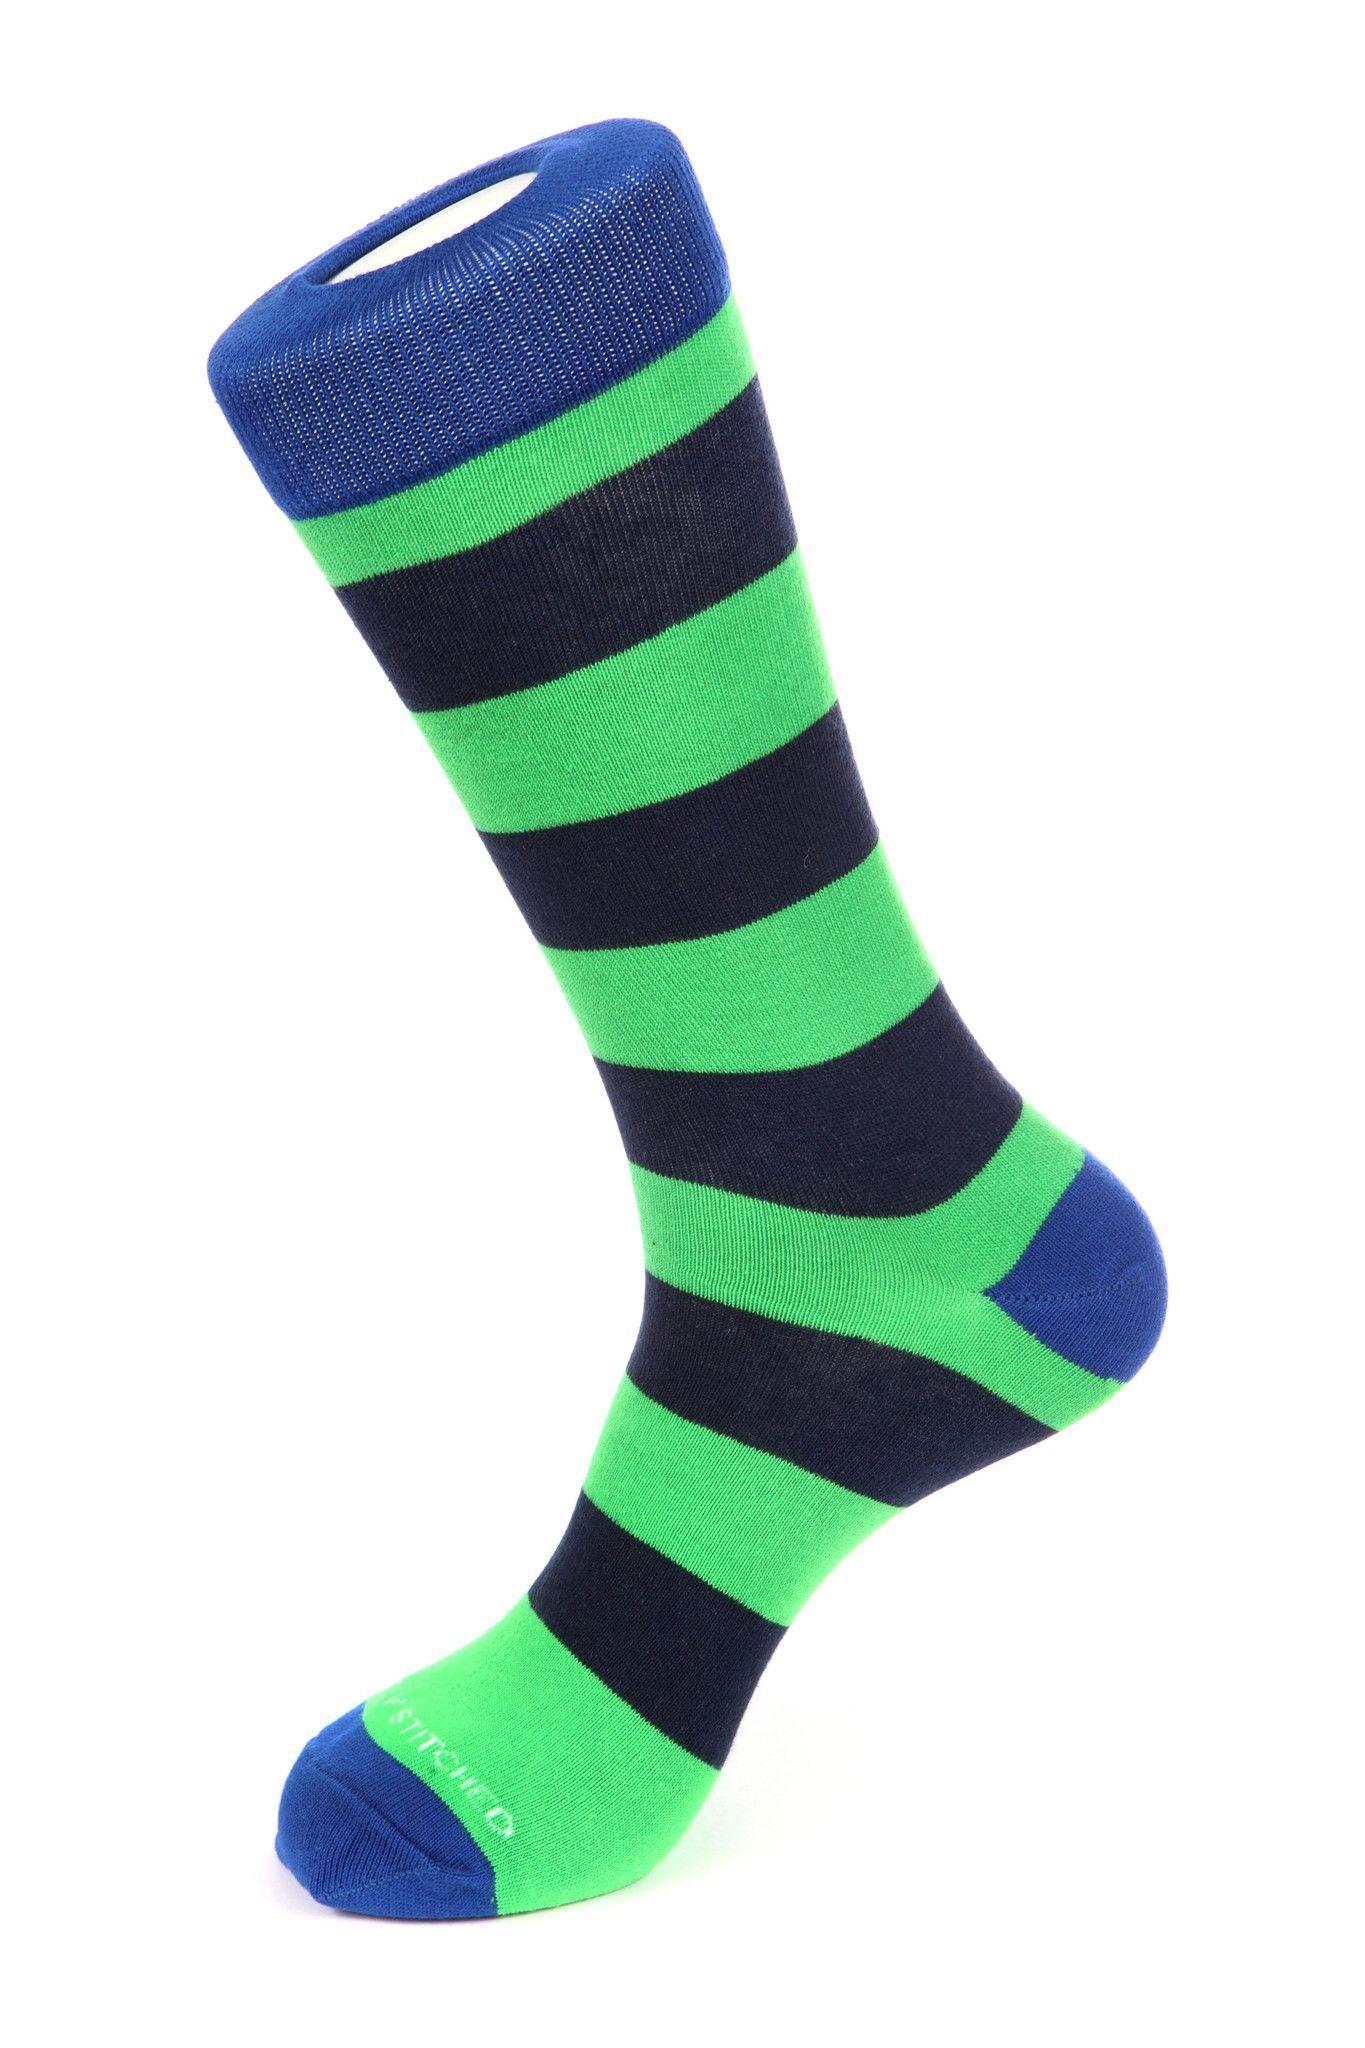 Rugby Sock With Images Socks Custom Socks Striped Socks